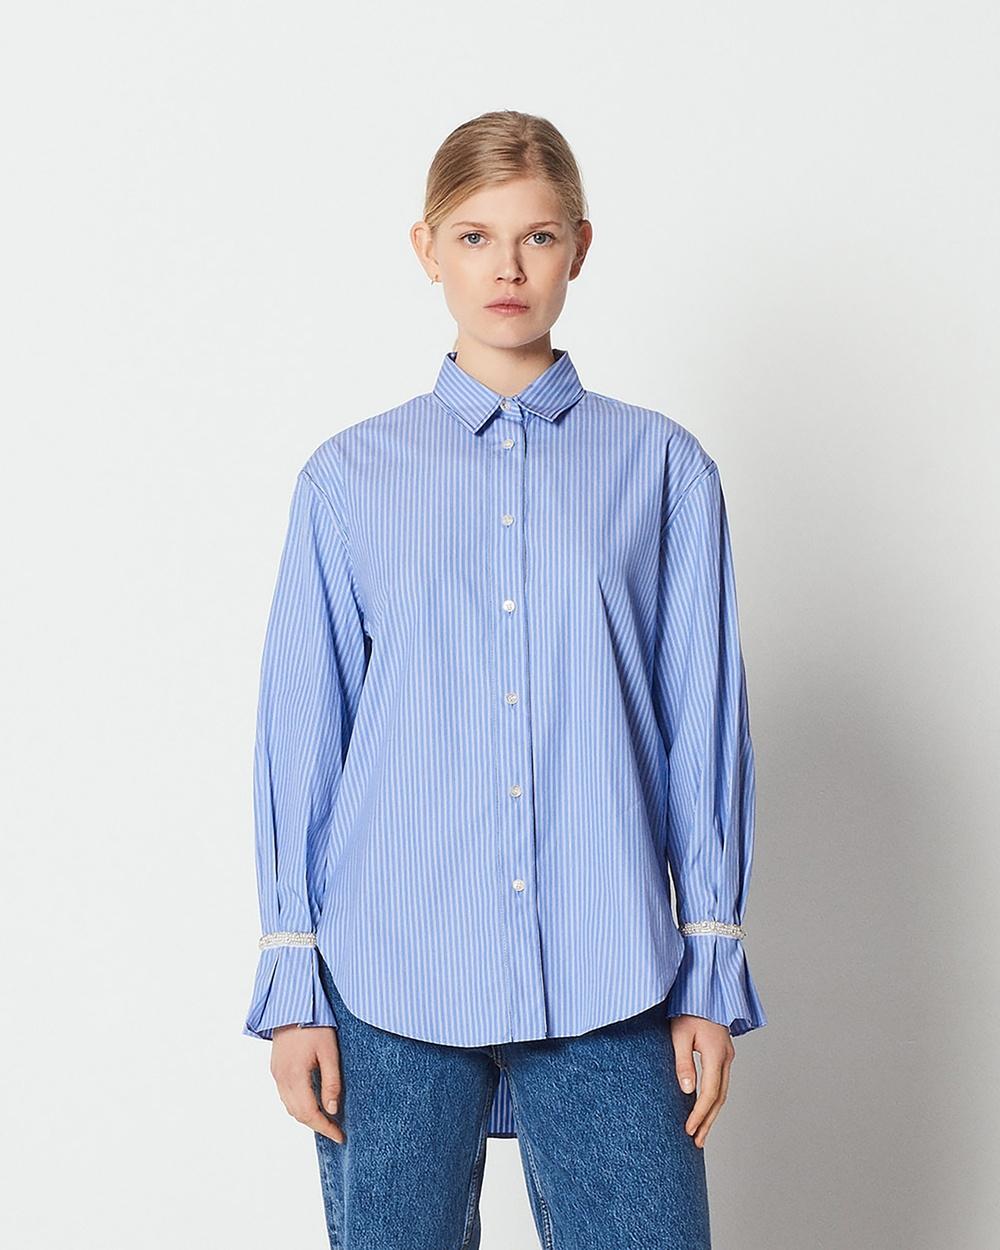 Sandro Sociologie Shirt Tops Blue Sociologie Shirt